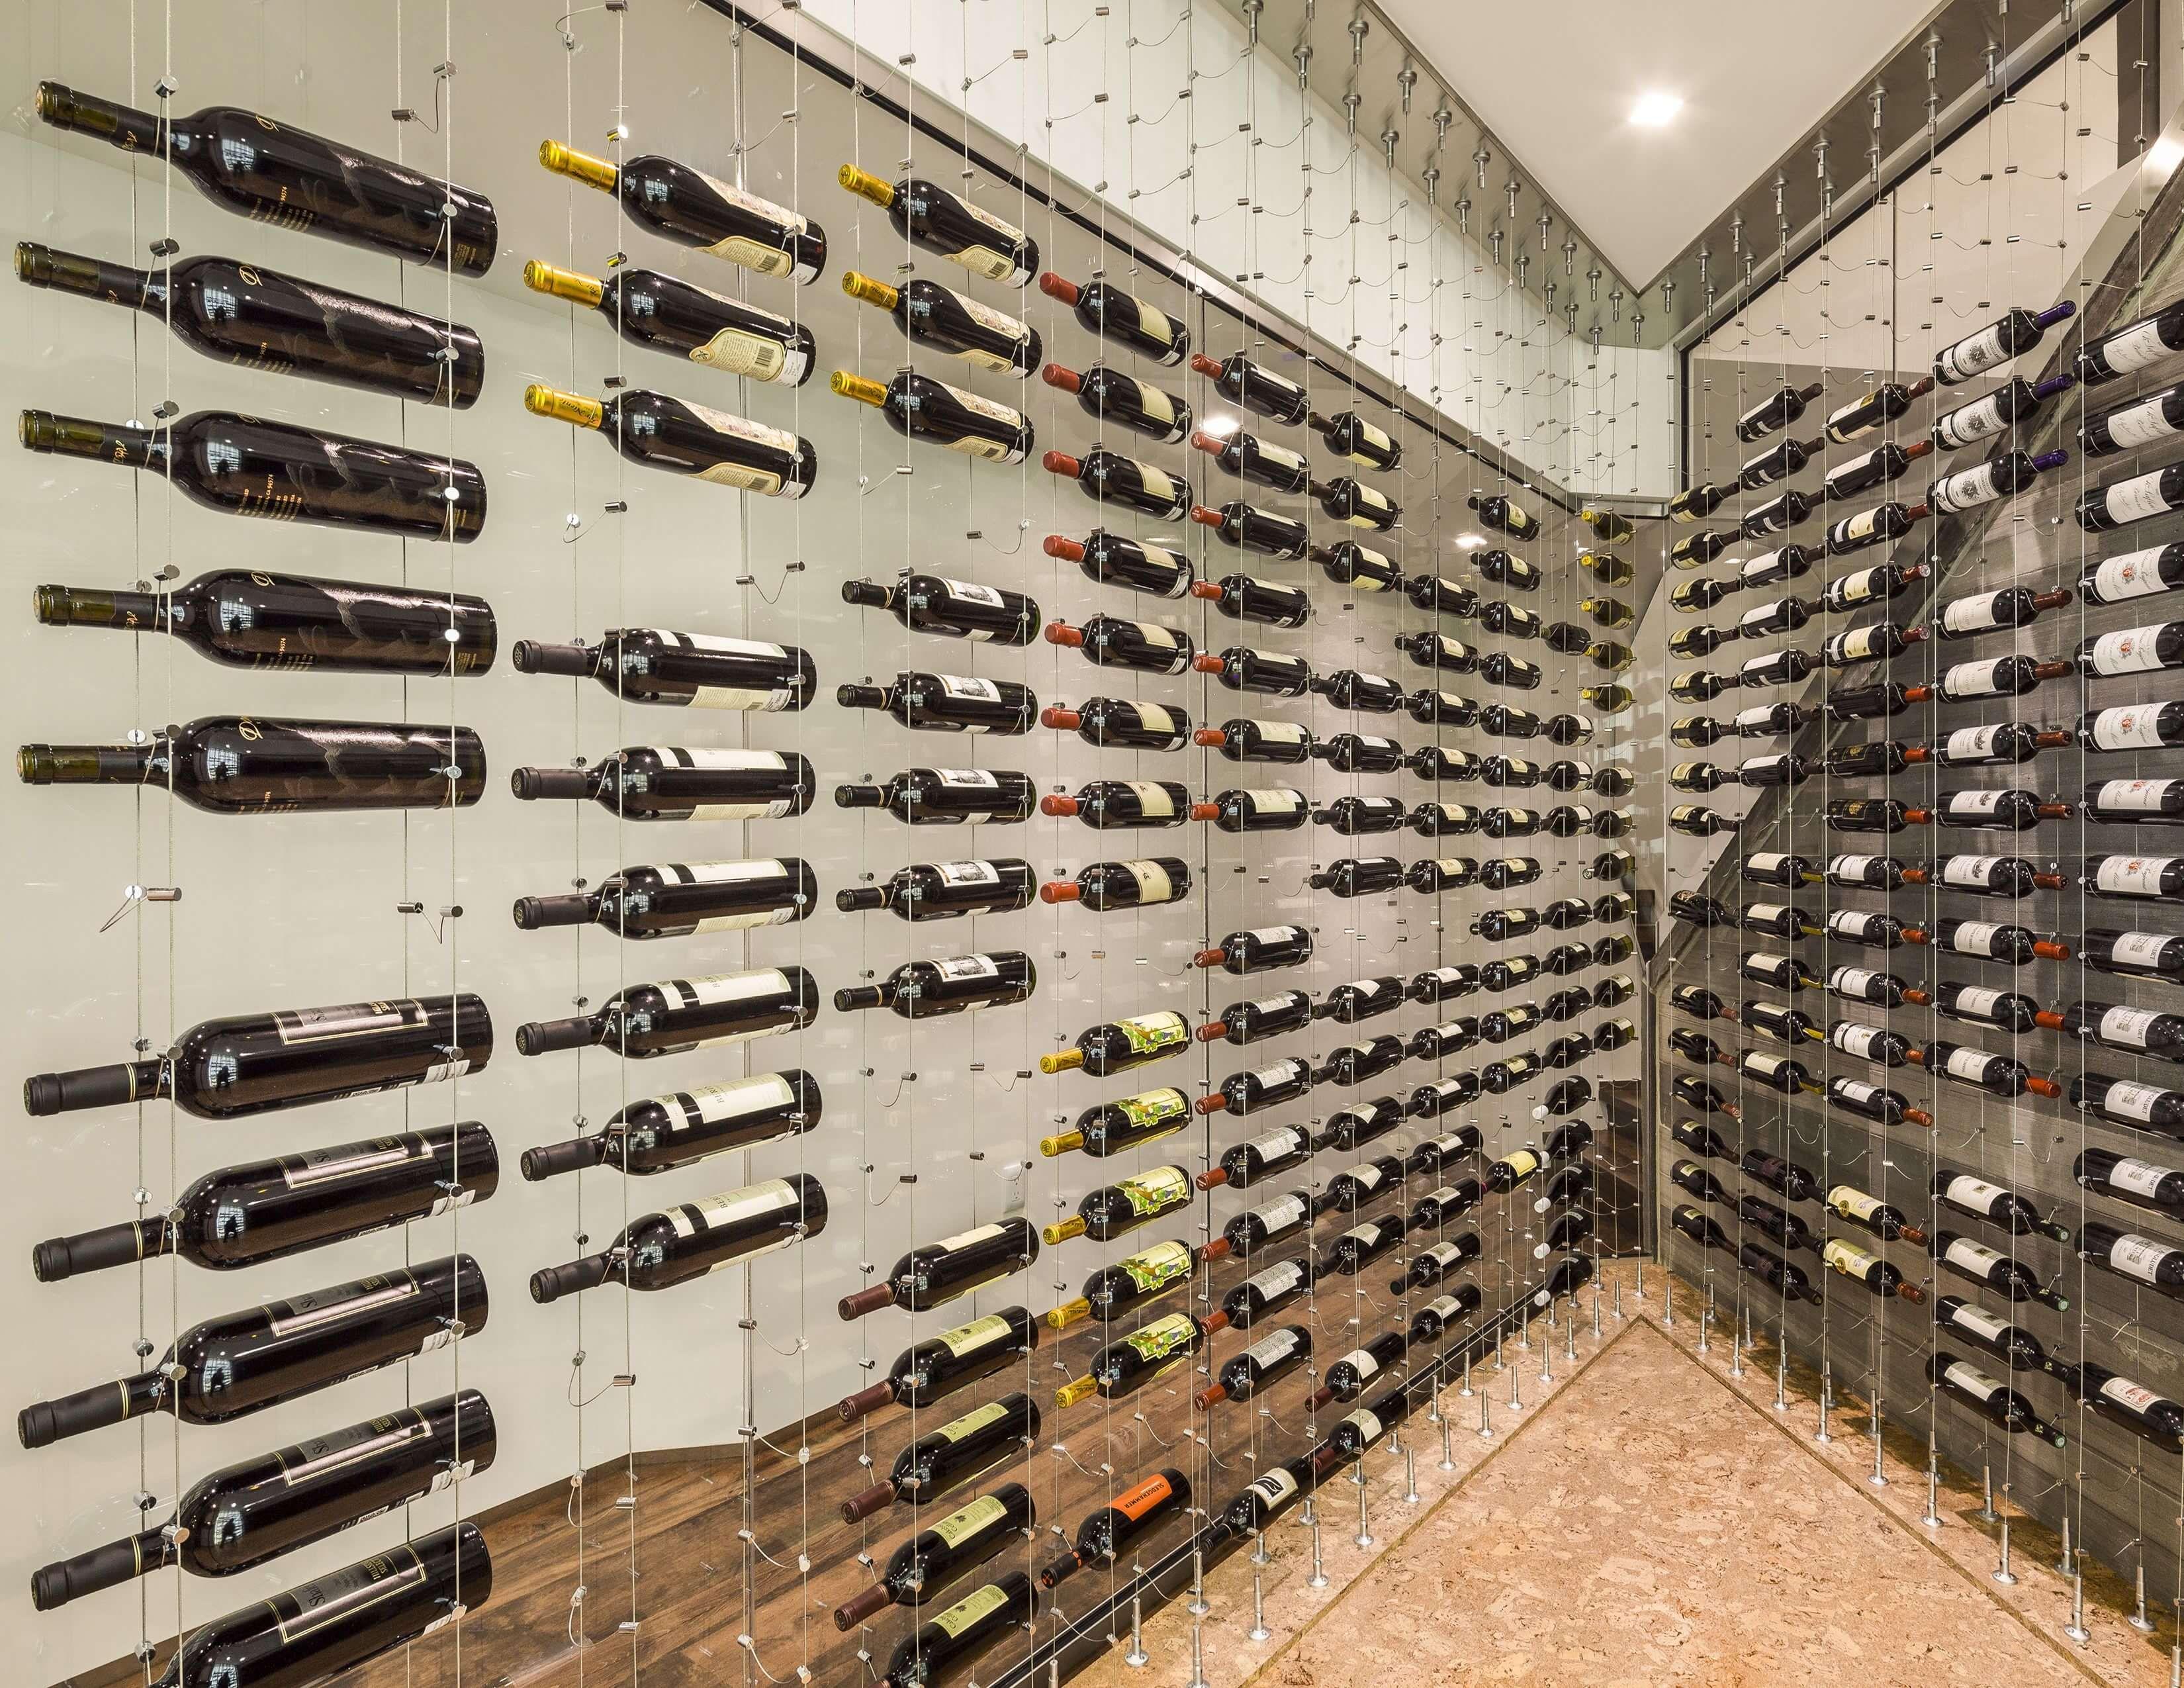 Climatisation Cave 224 Vin Design Cannes Antibes Mougins Le